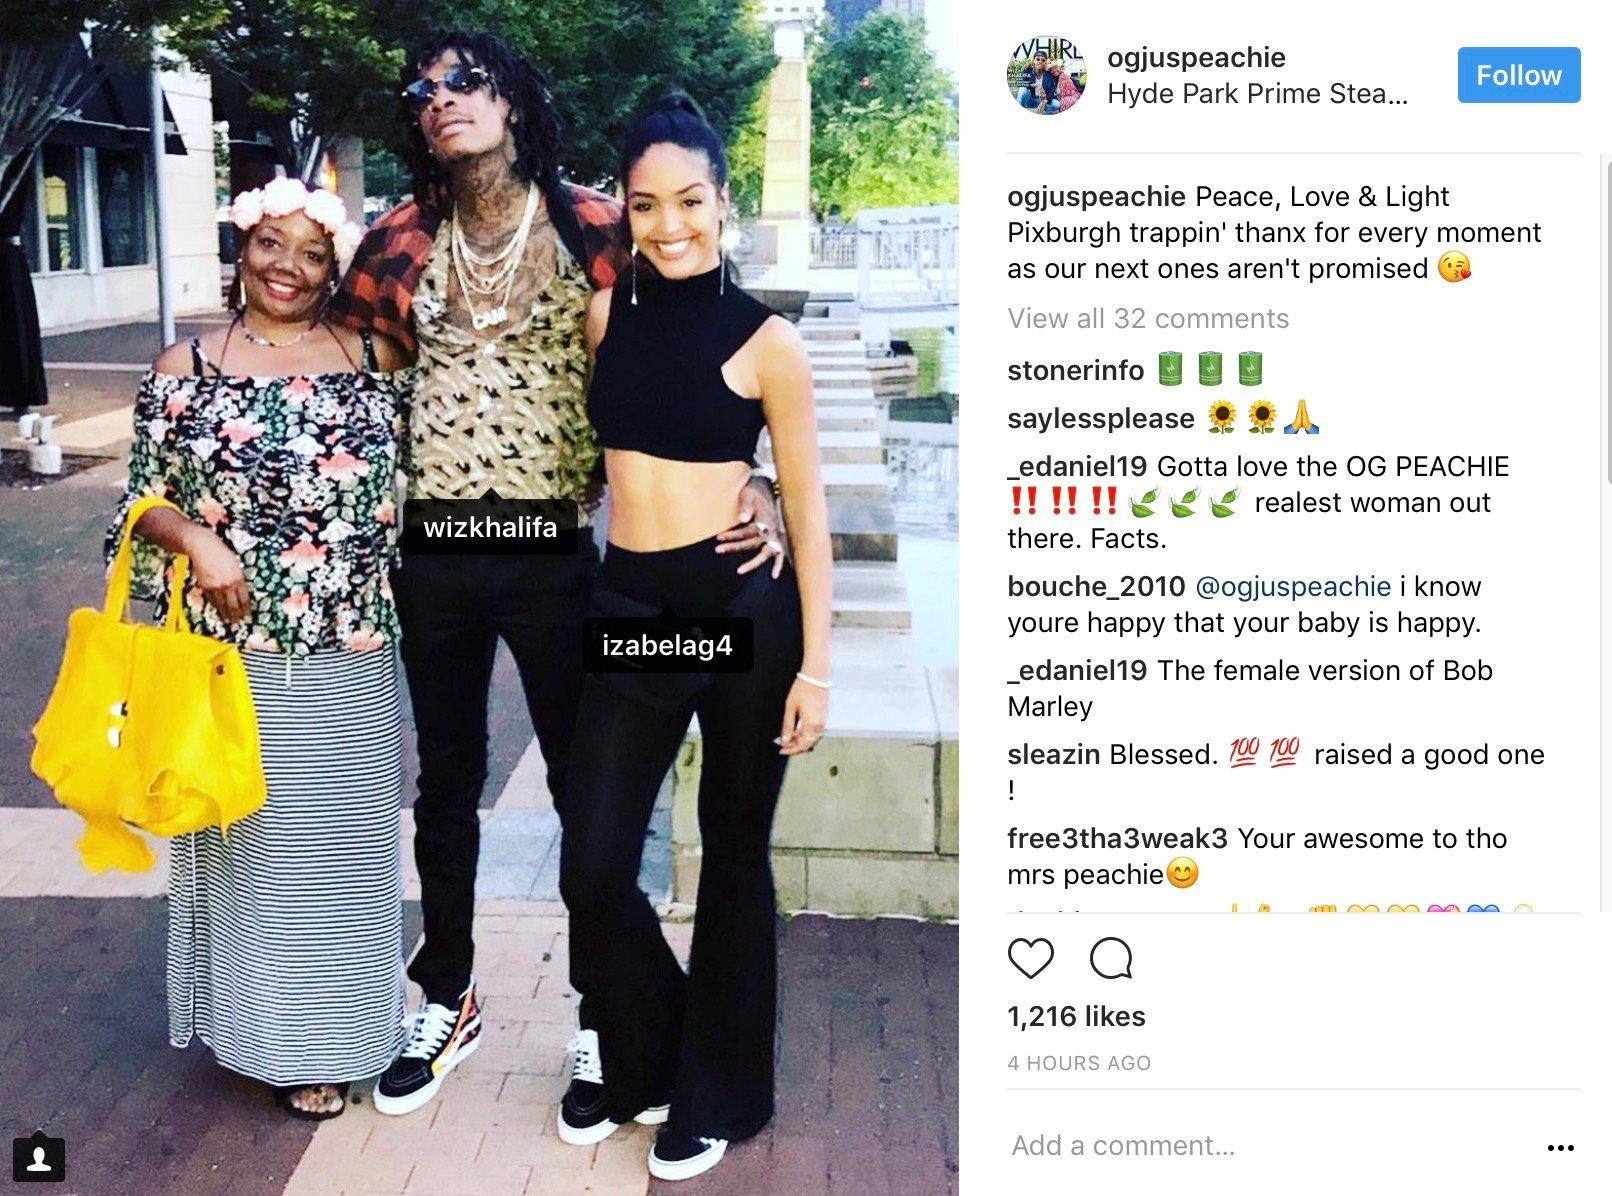 Wiz Khalifa & Longtime Bae Izabela Low-Key Call It Quits? –